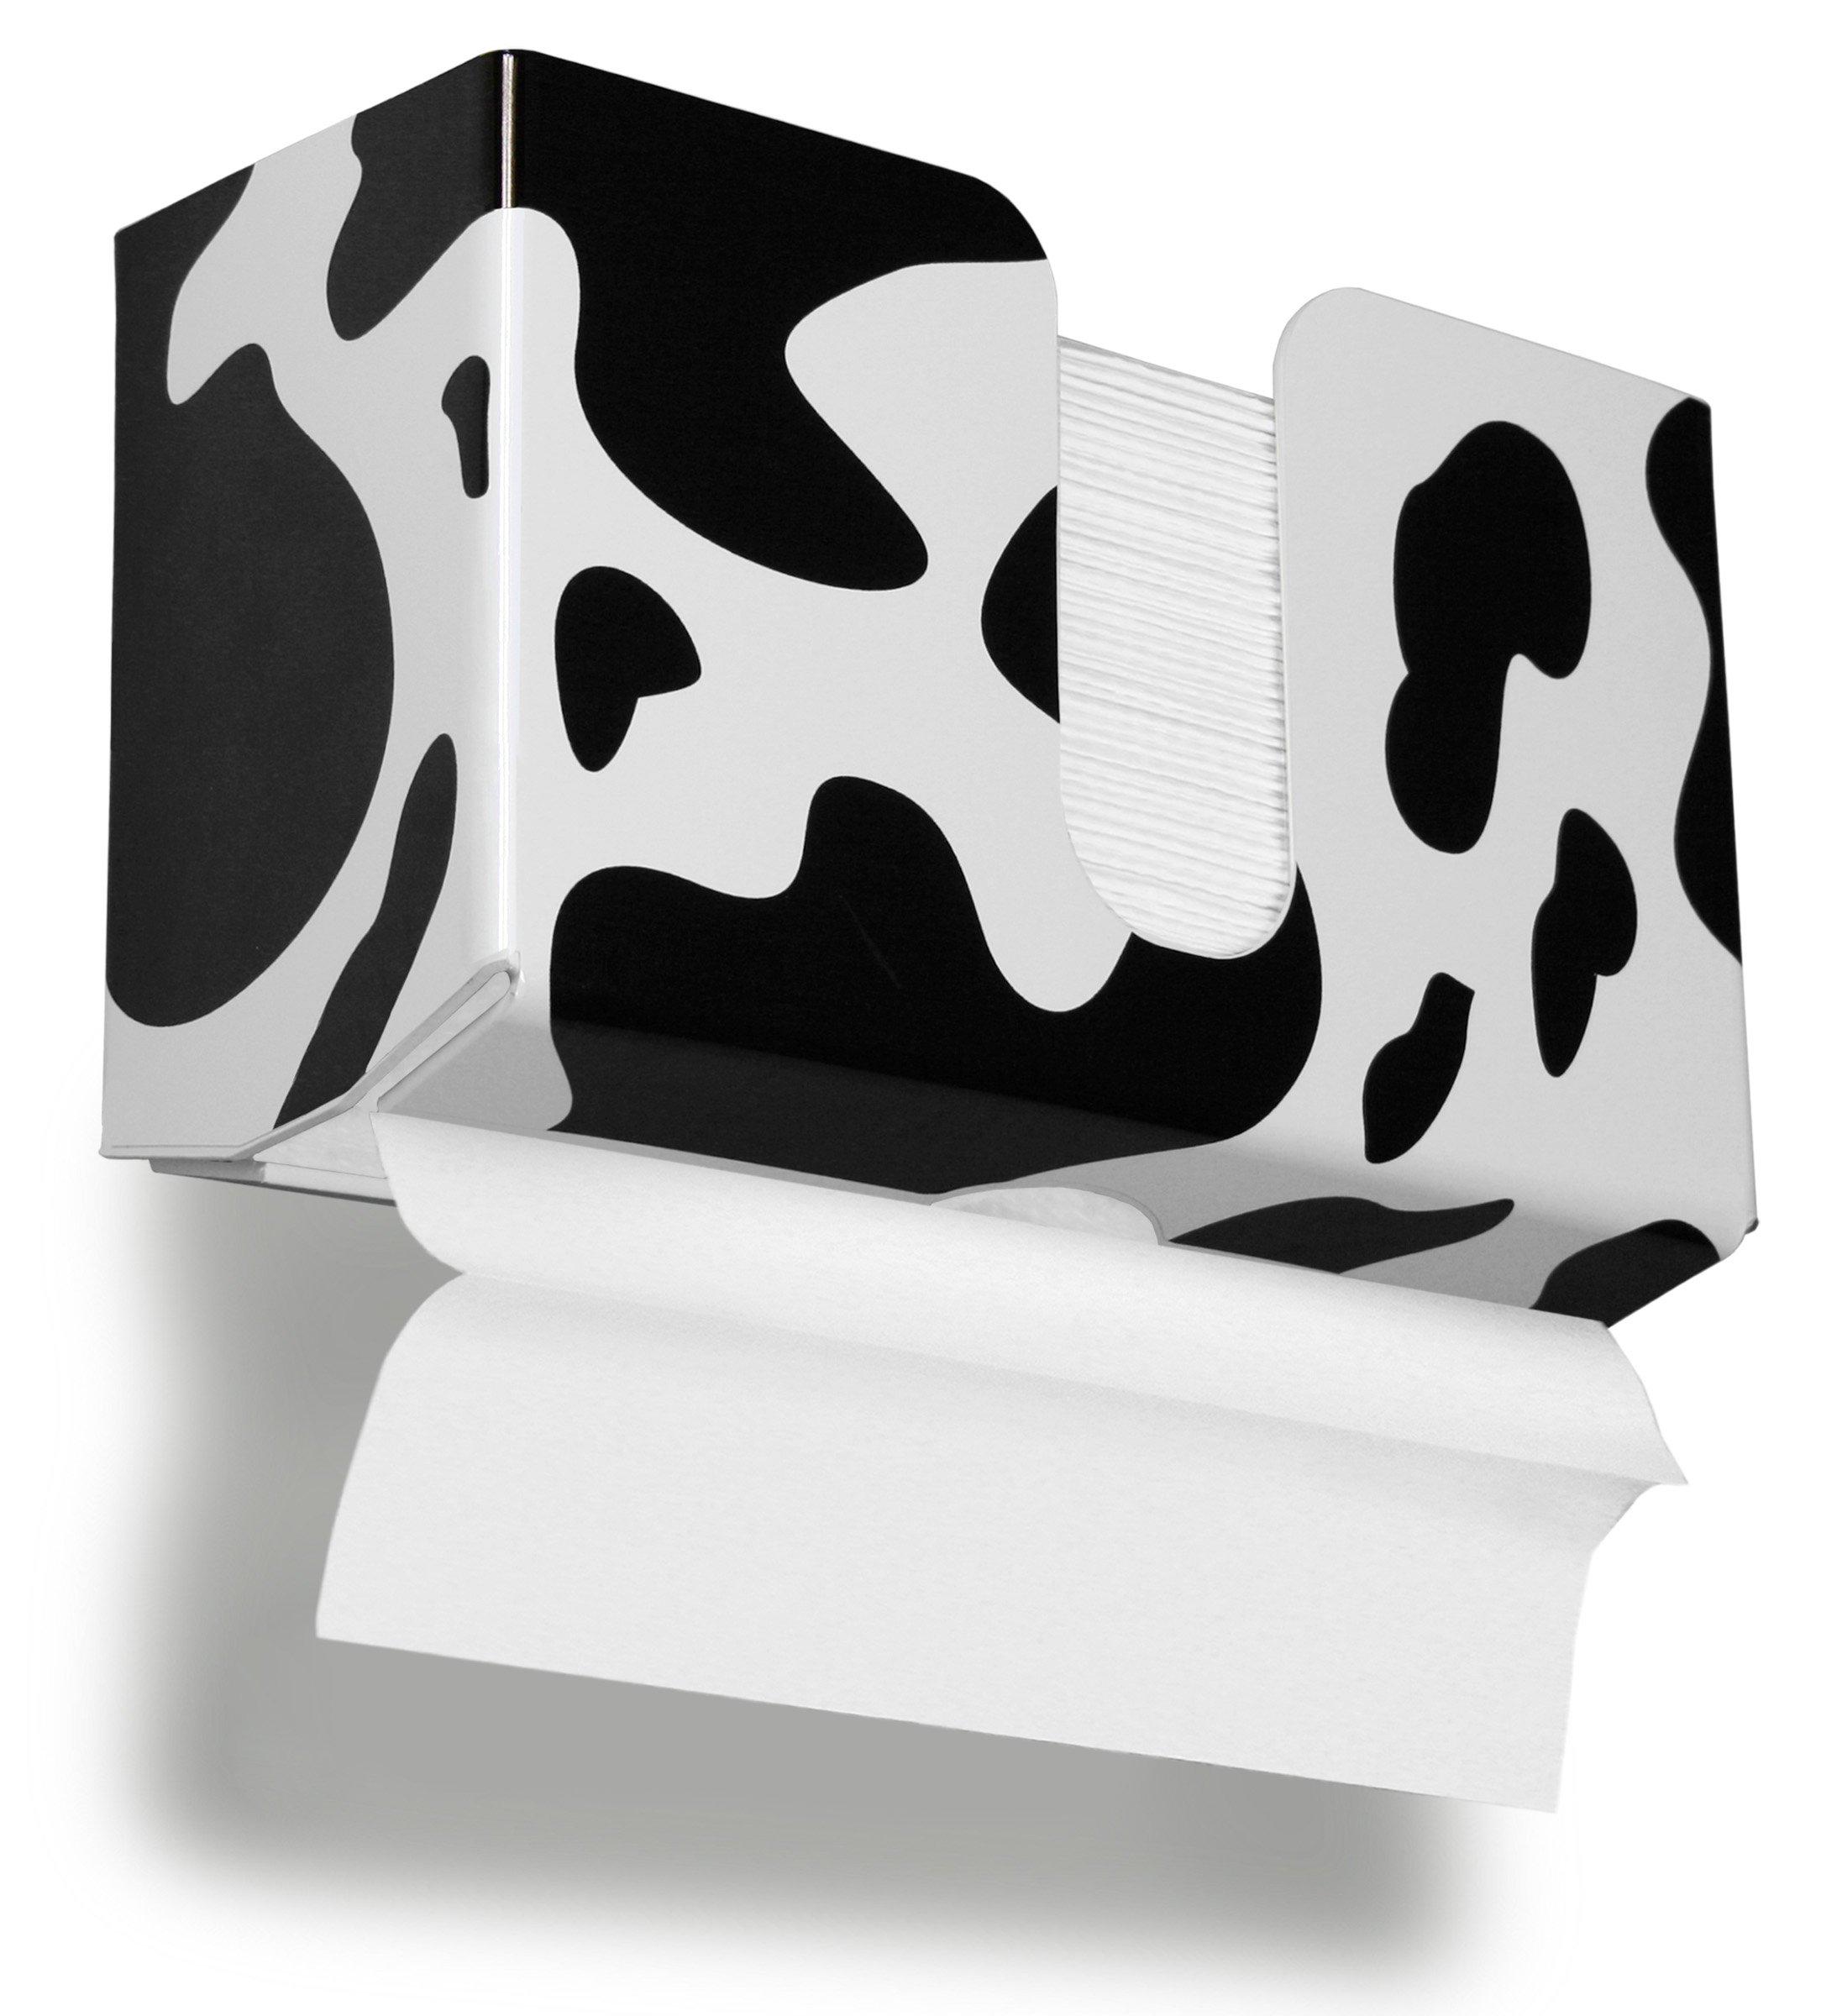 TrippNT 51341 Cow Pattern Plastic Dual Dispensing Paper Towel Holder, 10 7/8'' Width x 6 1/2'' Height x 4 ¼'' Depth